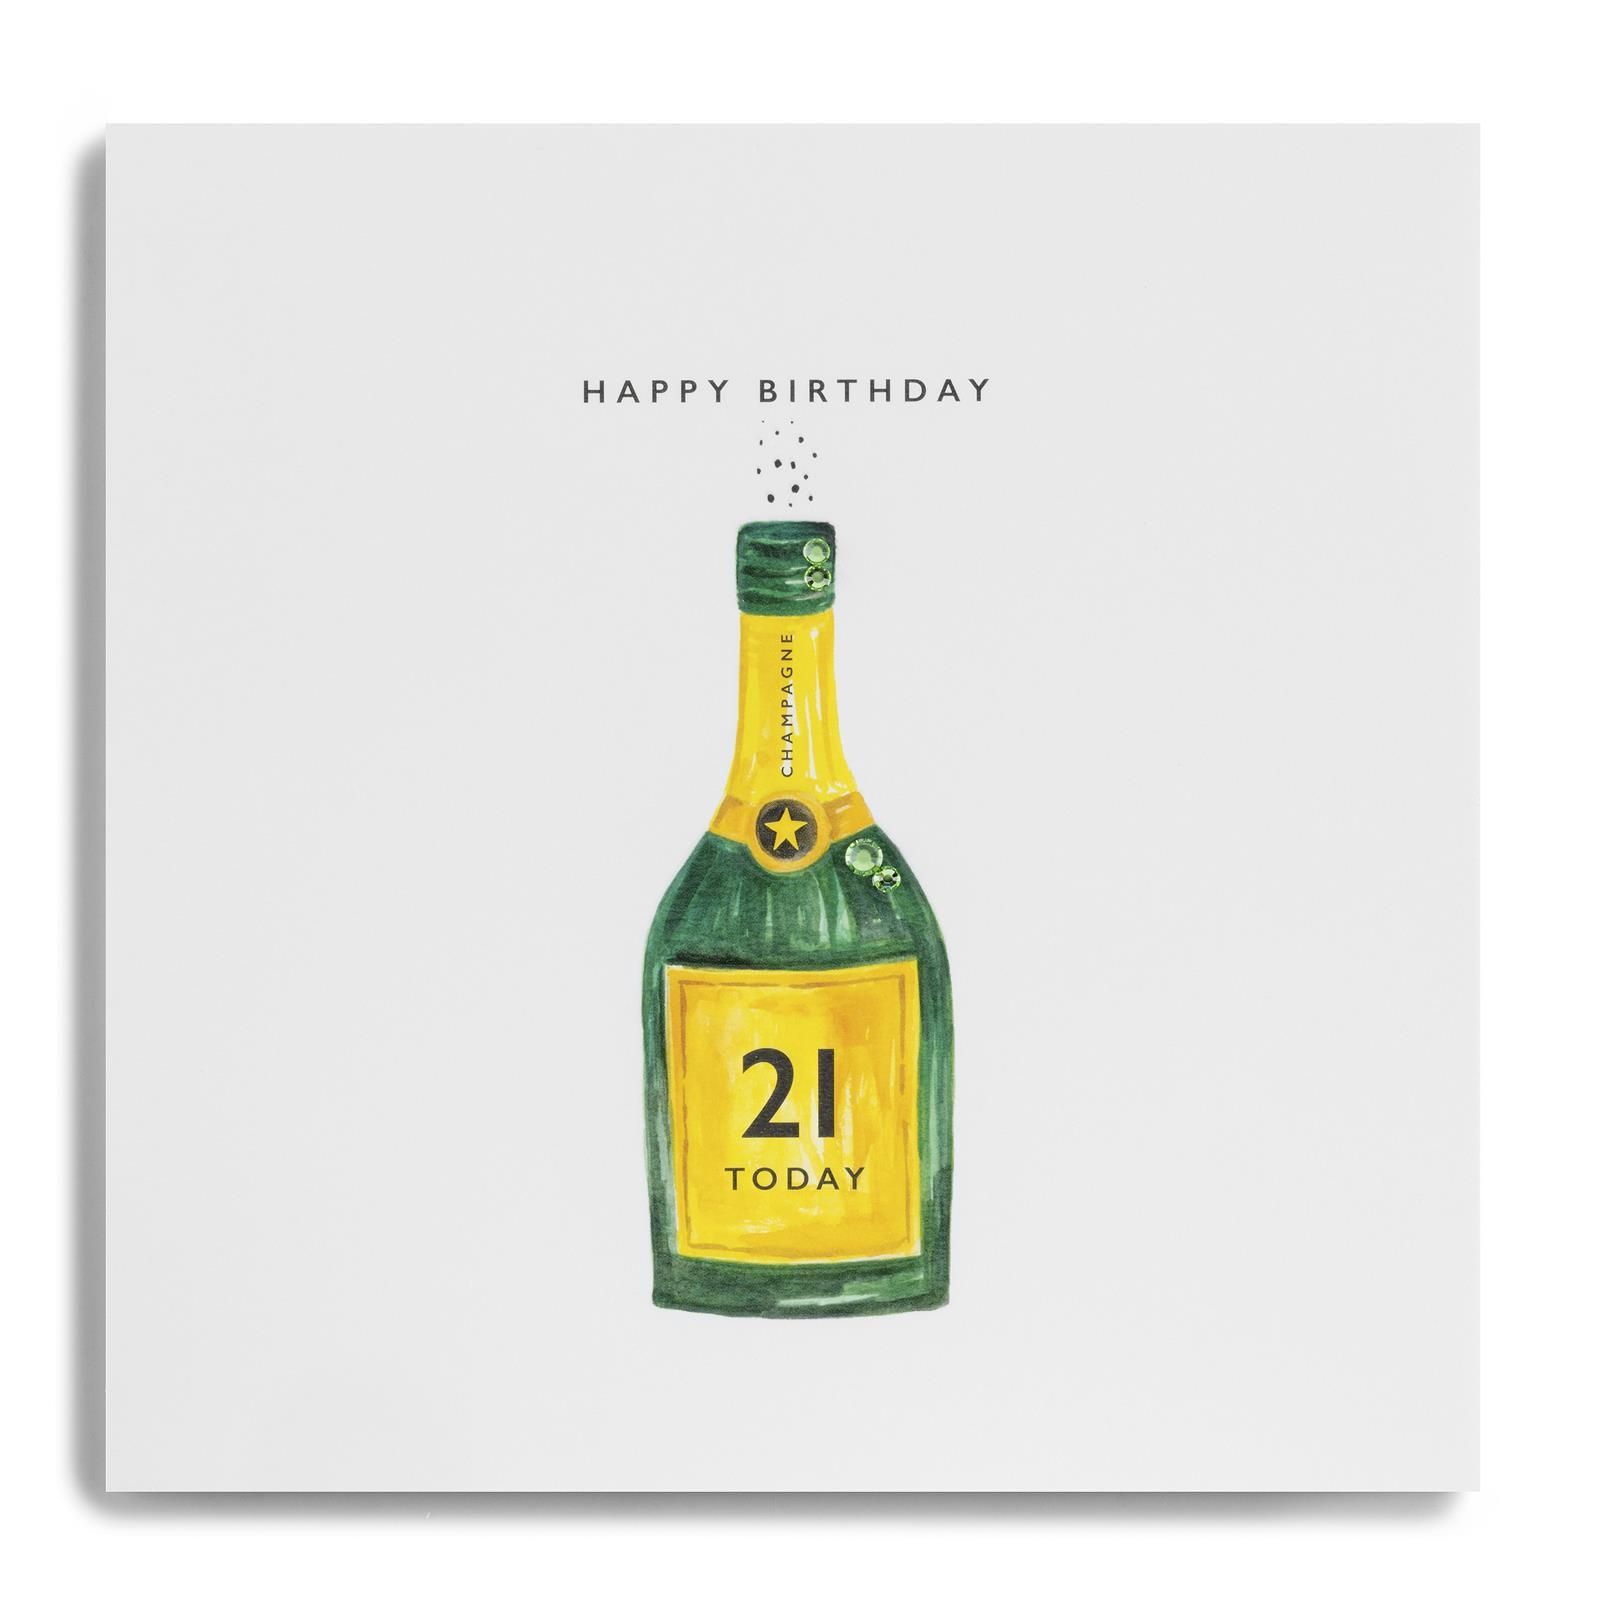 Happy Bithday 21 Today Bottle Of Champagne Pke10 Age 21 Birthday